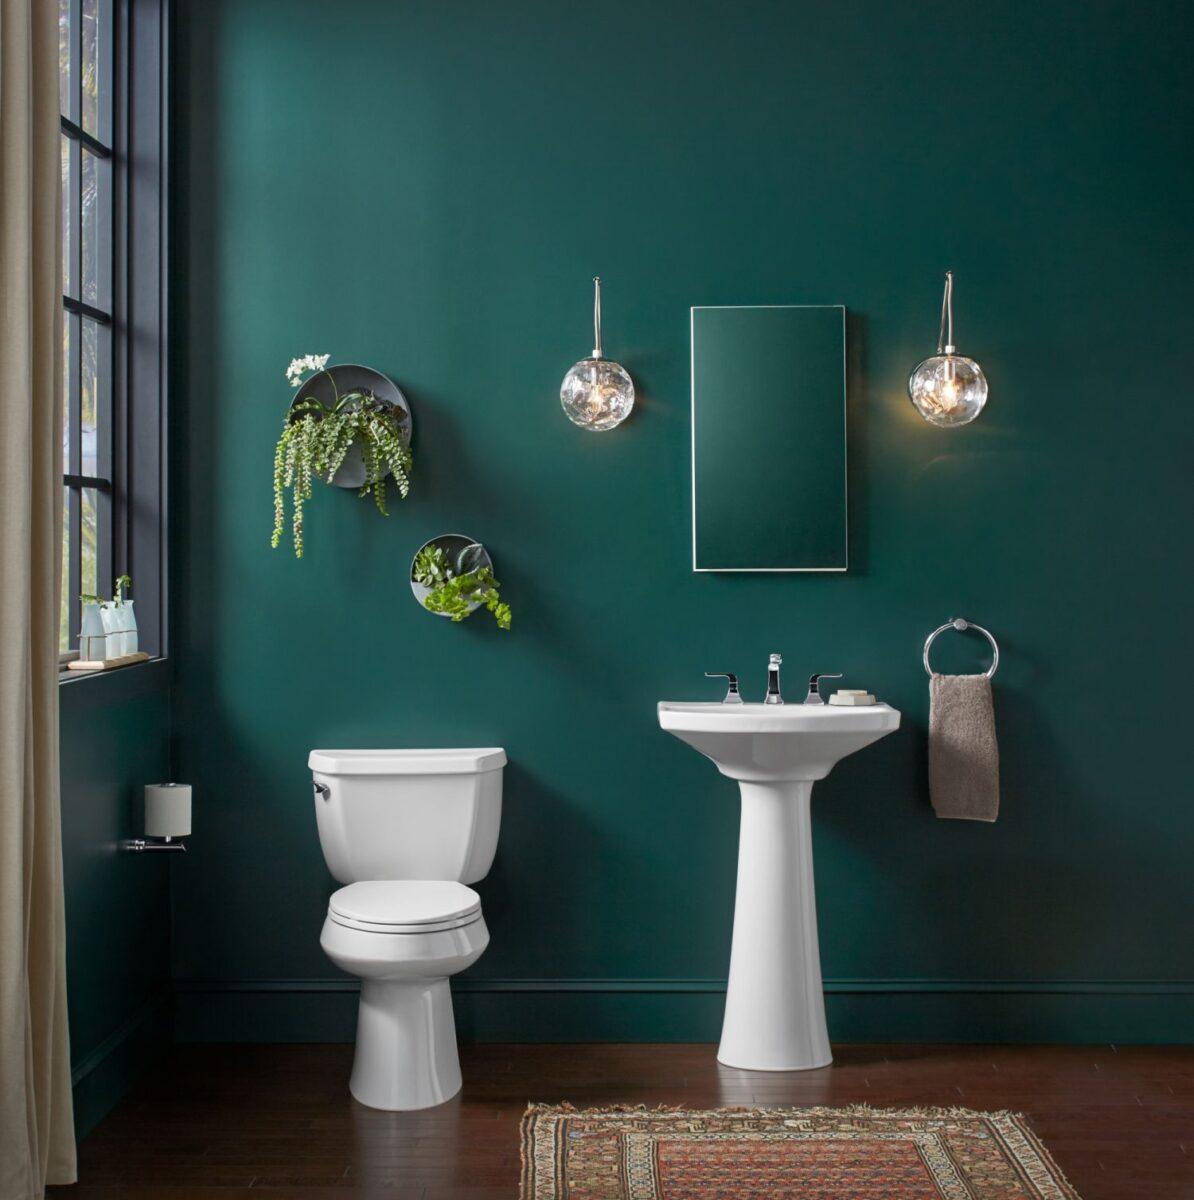 Bagno-pareti-color-verde-23